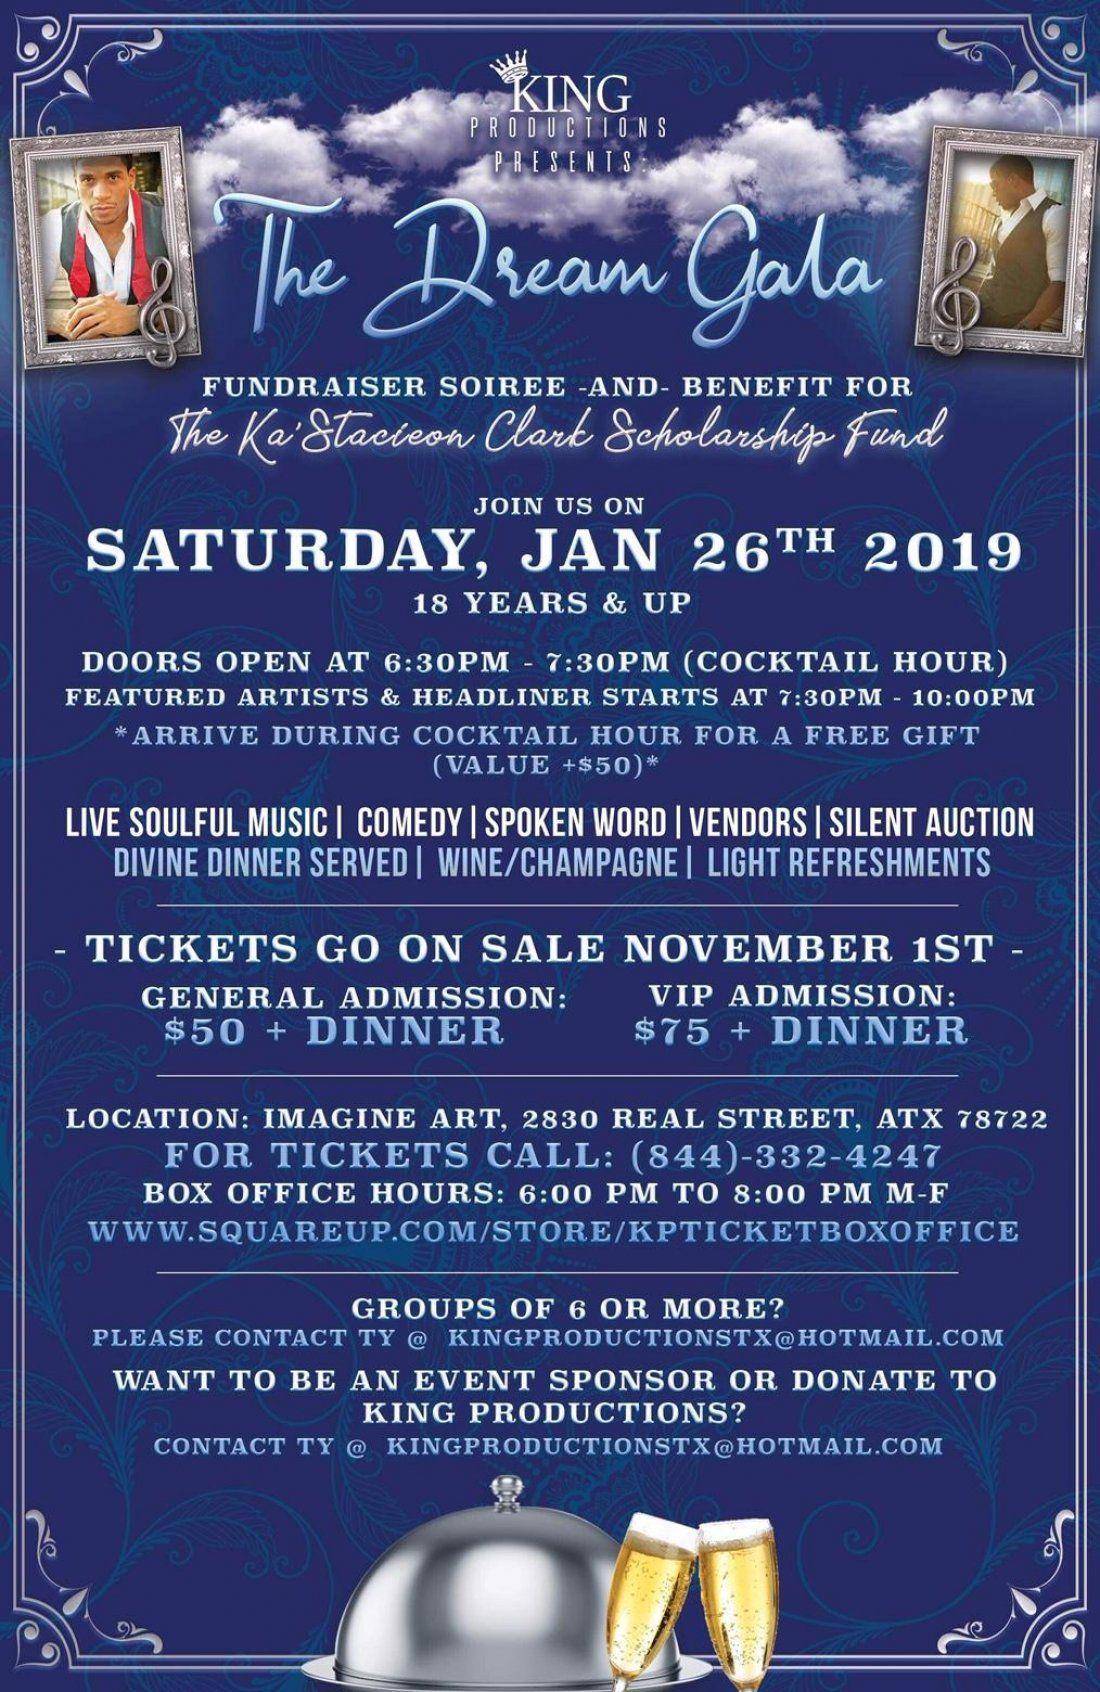 Dream Gala Fundraiser & Suicide Prevention Benefit